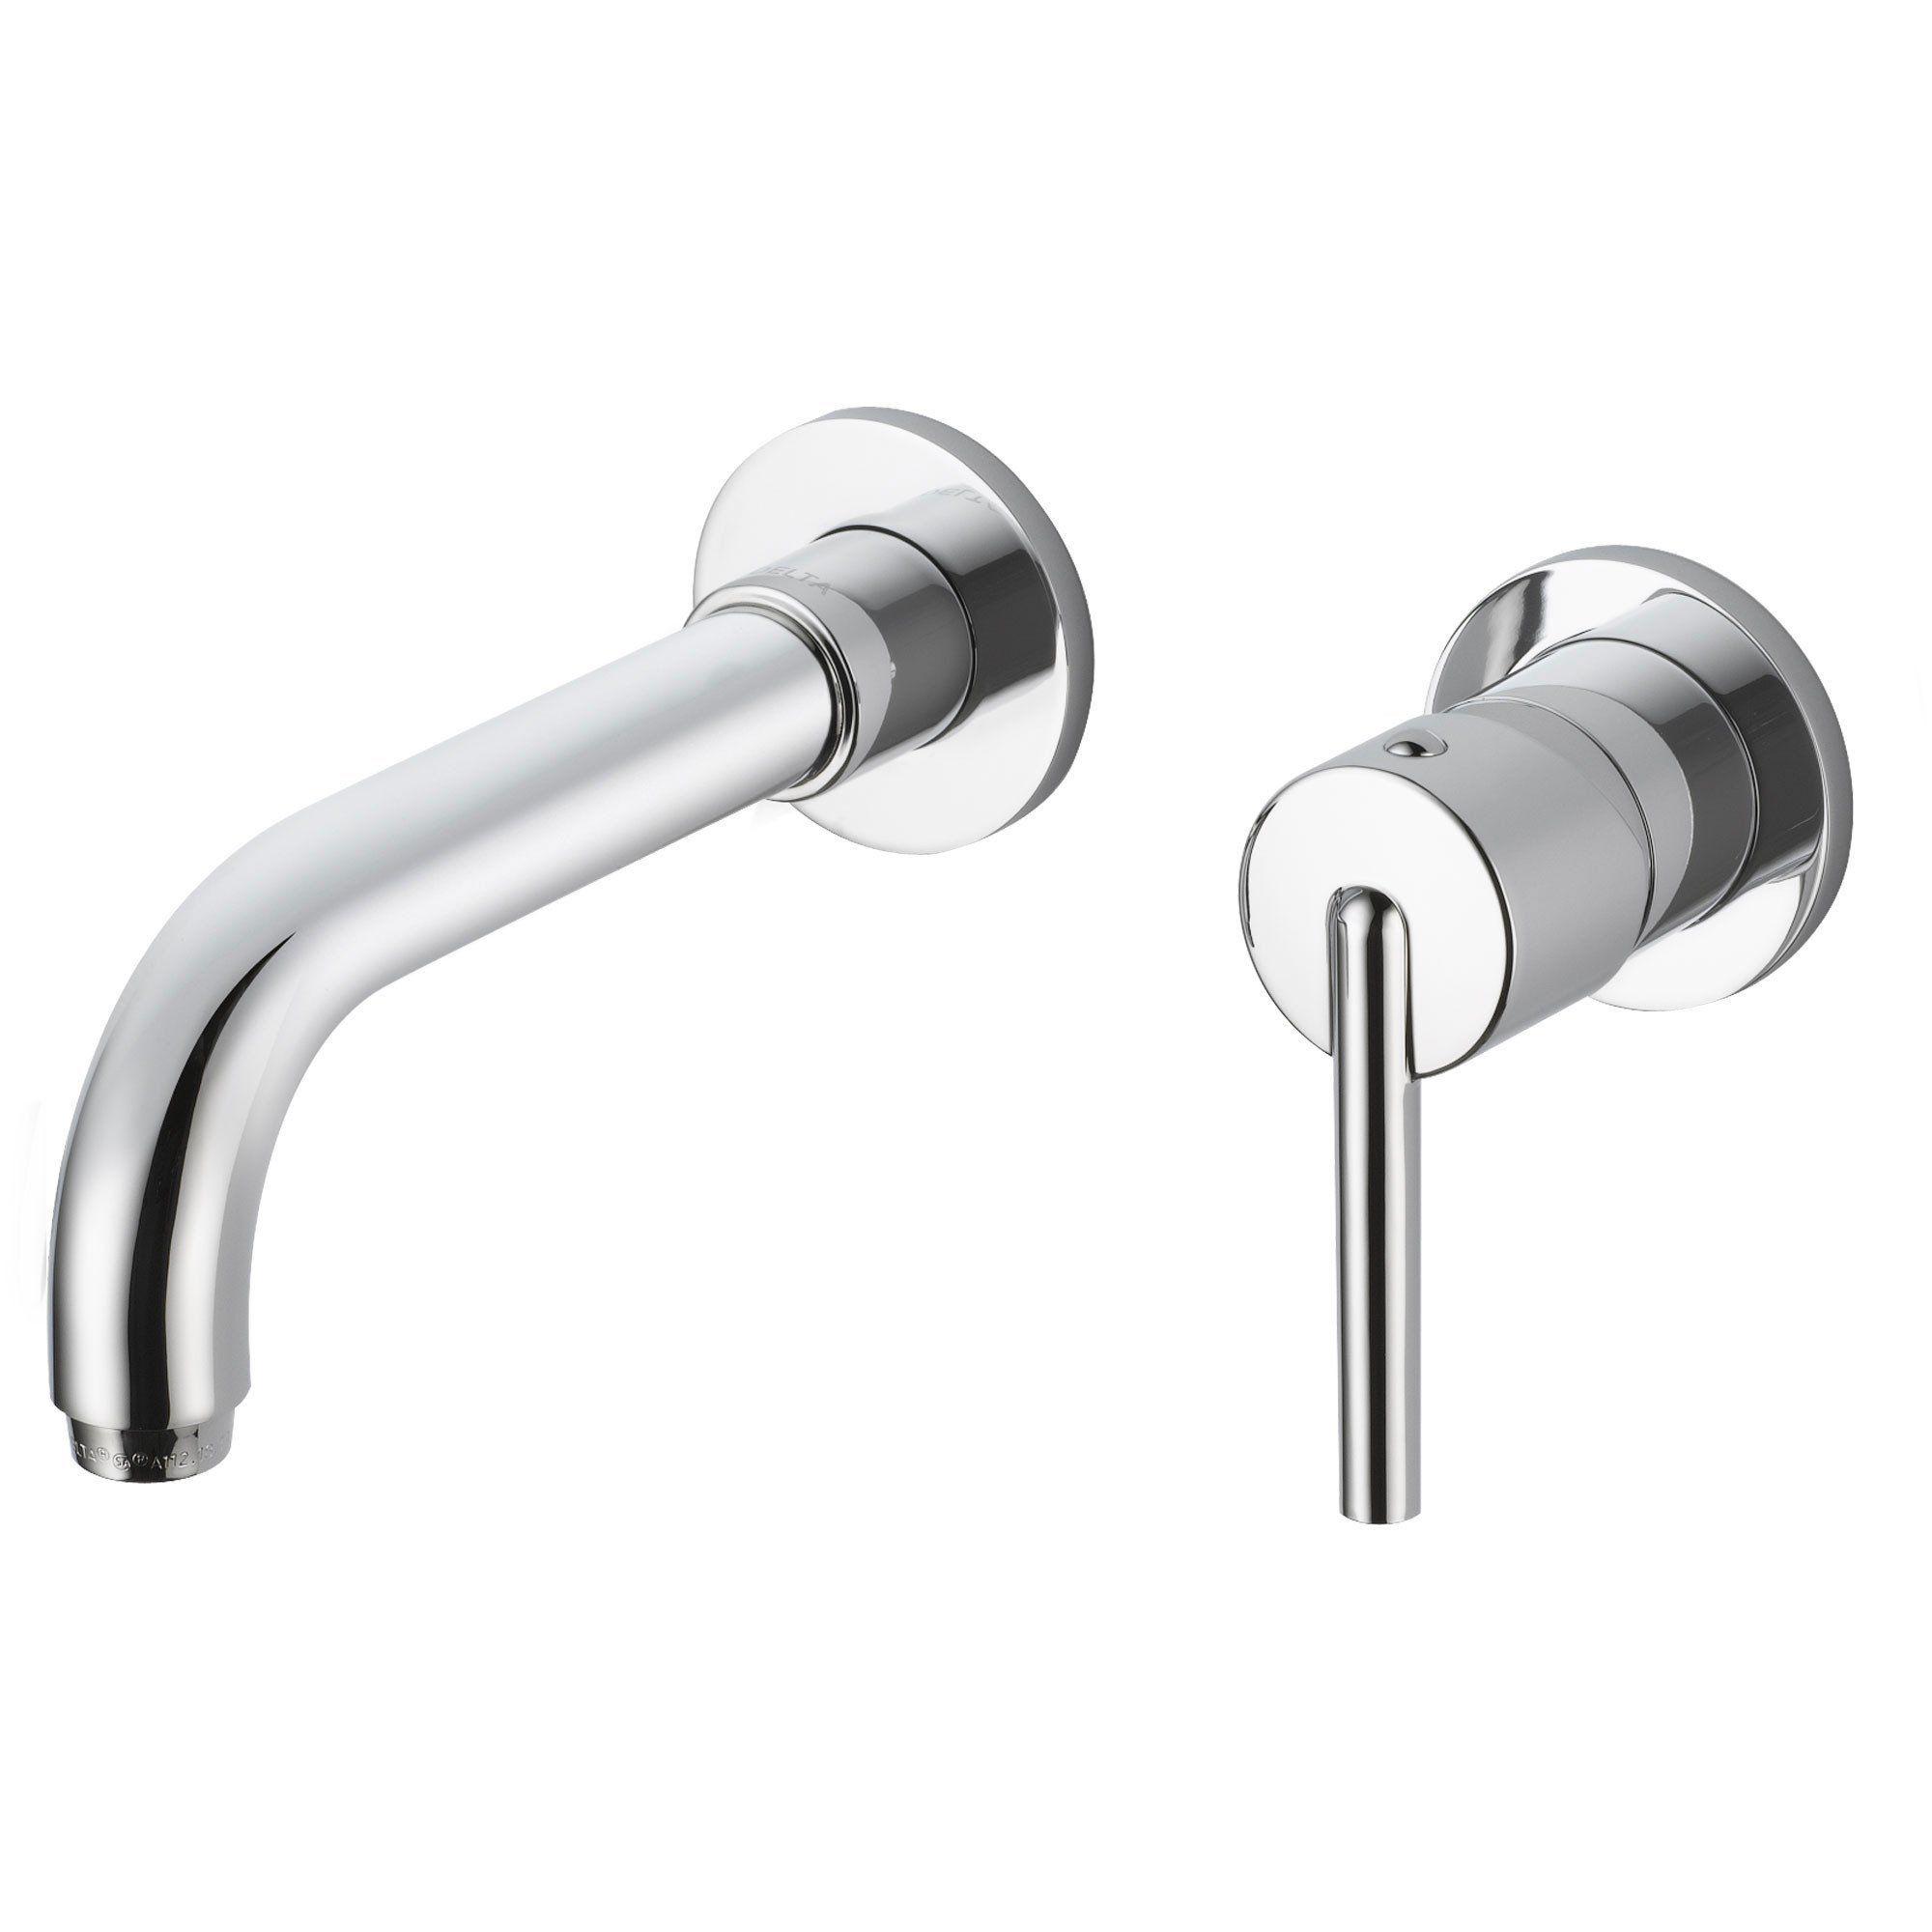 Delta Trinsic Wall Mount Single Handle Chrome Finish Bathroom Faucet ...